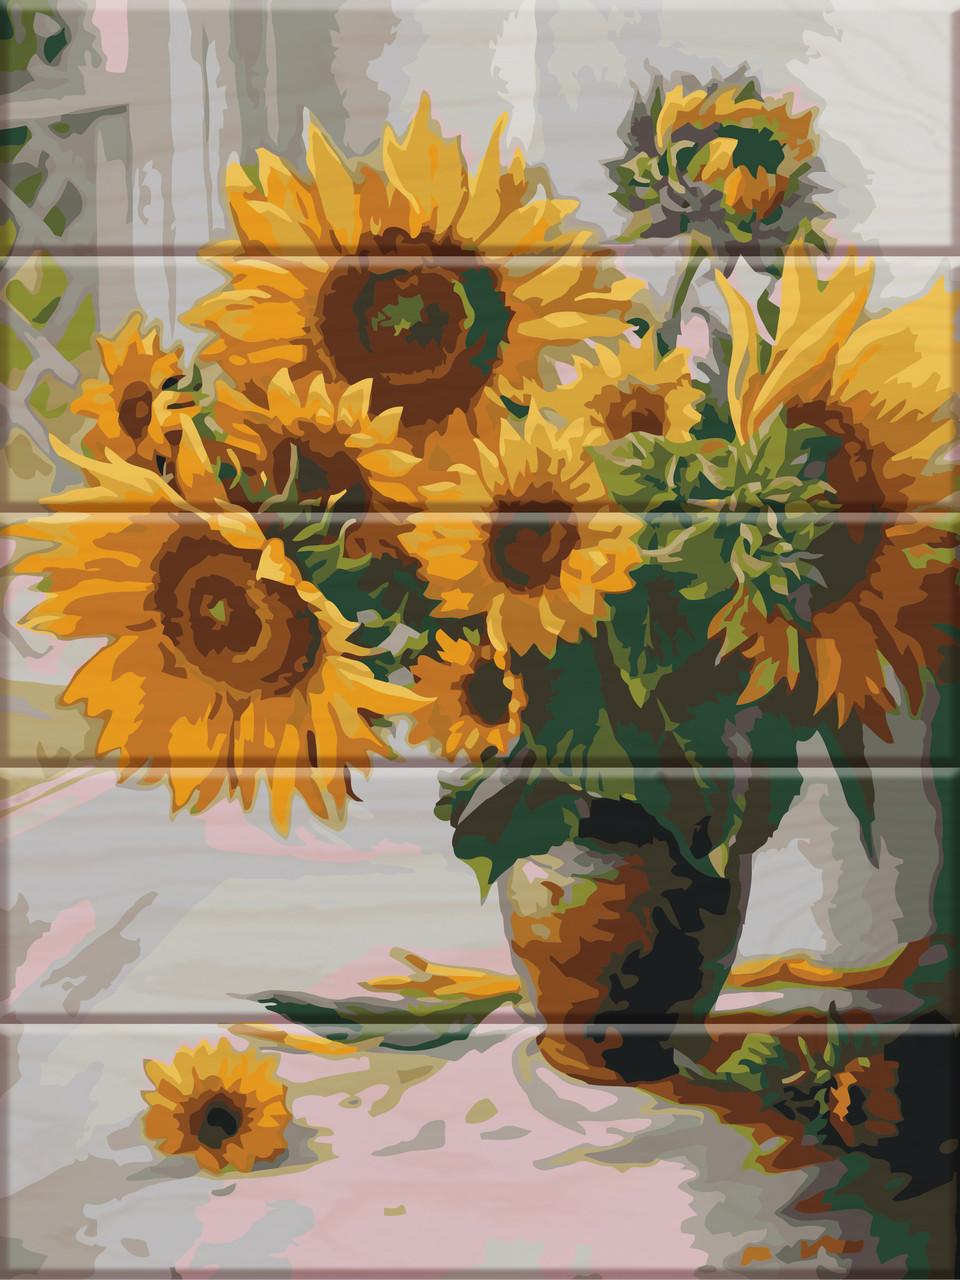 Картина по номерам Соняшники, 30x40 см., Art Story